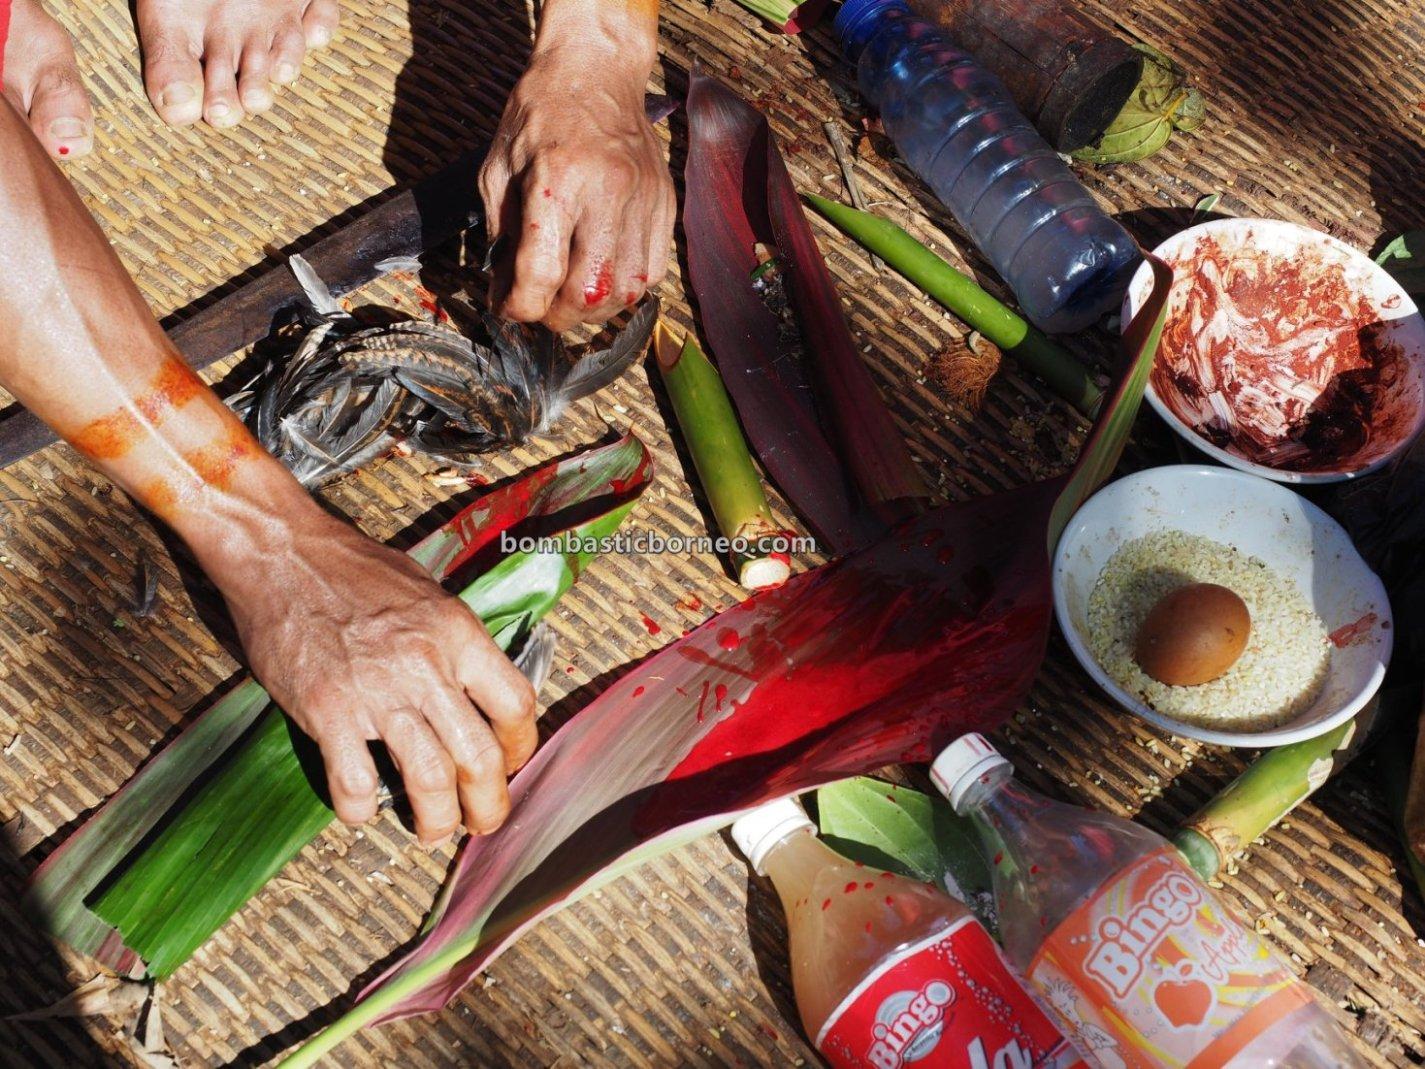 Nyobeng Rambai, authentic, village, destination, Indonesia, Bengkayang, Desa Sahan, Native, tribal, ritual, Obyek wisata, Tourism, trans border, 婆罗洲西加里曼丹, 孟加映比达友族部落, 印尼土著传统文化